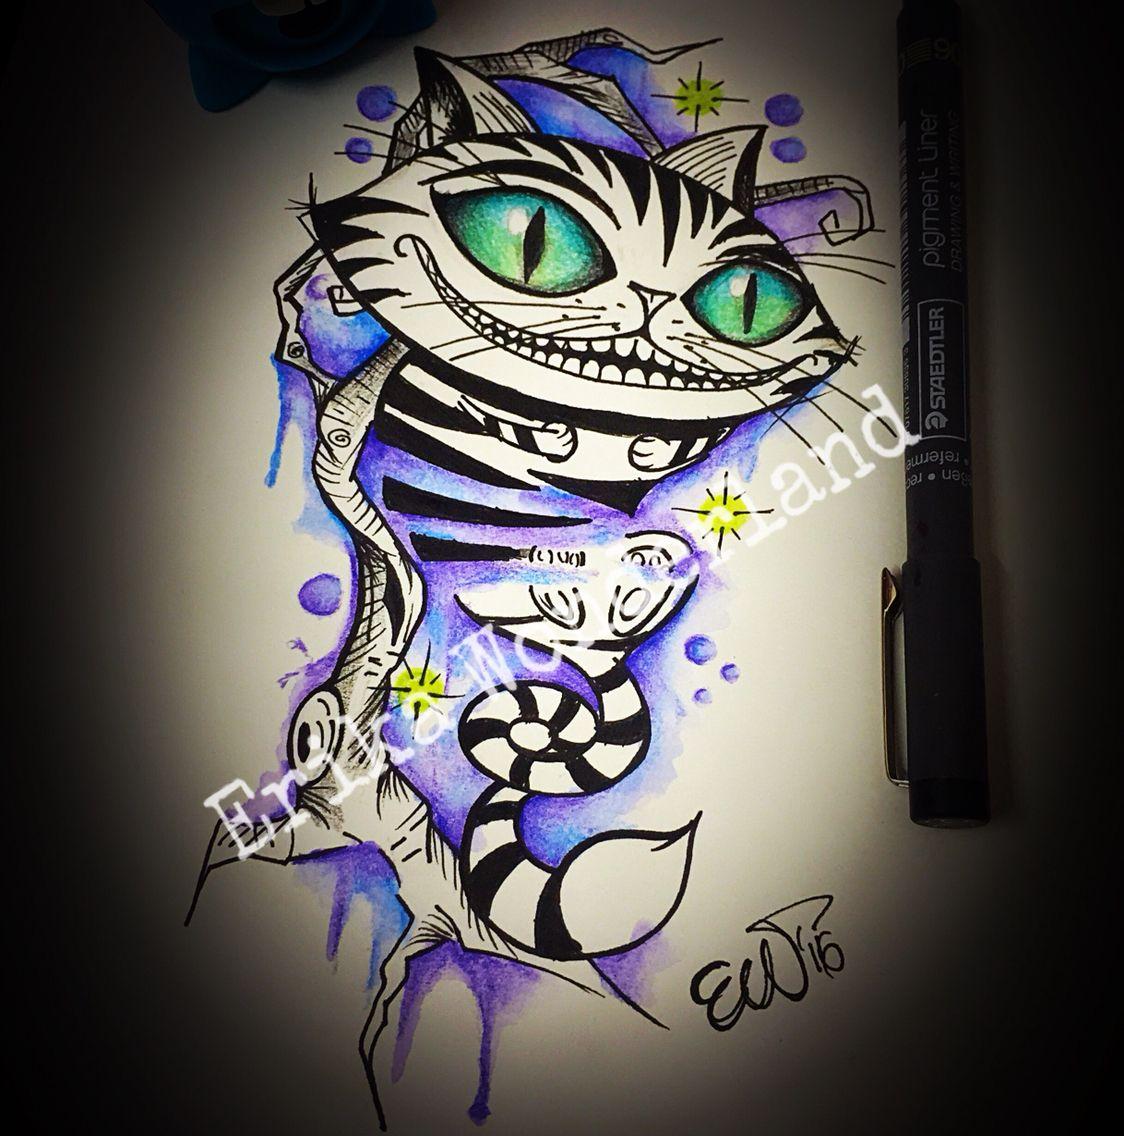 Stregatto tattoo